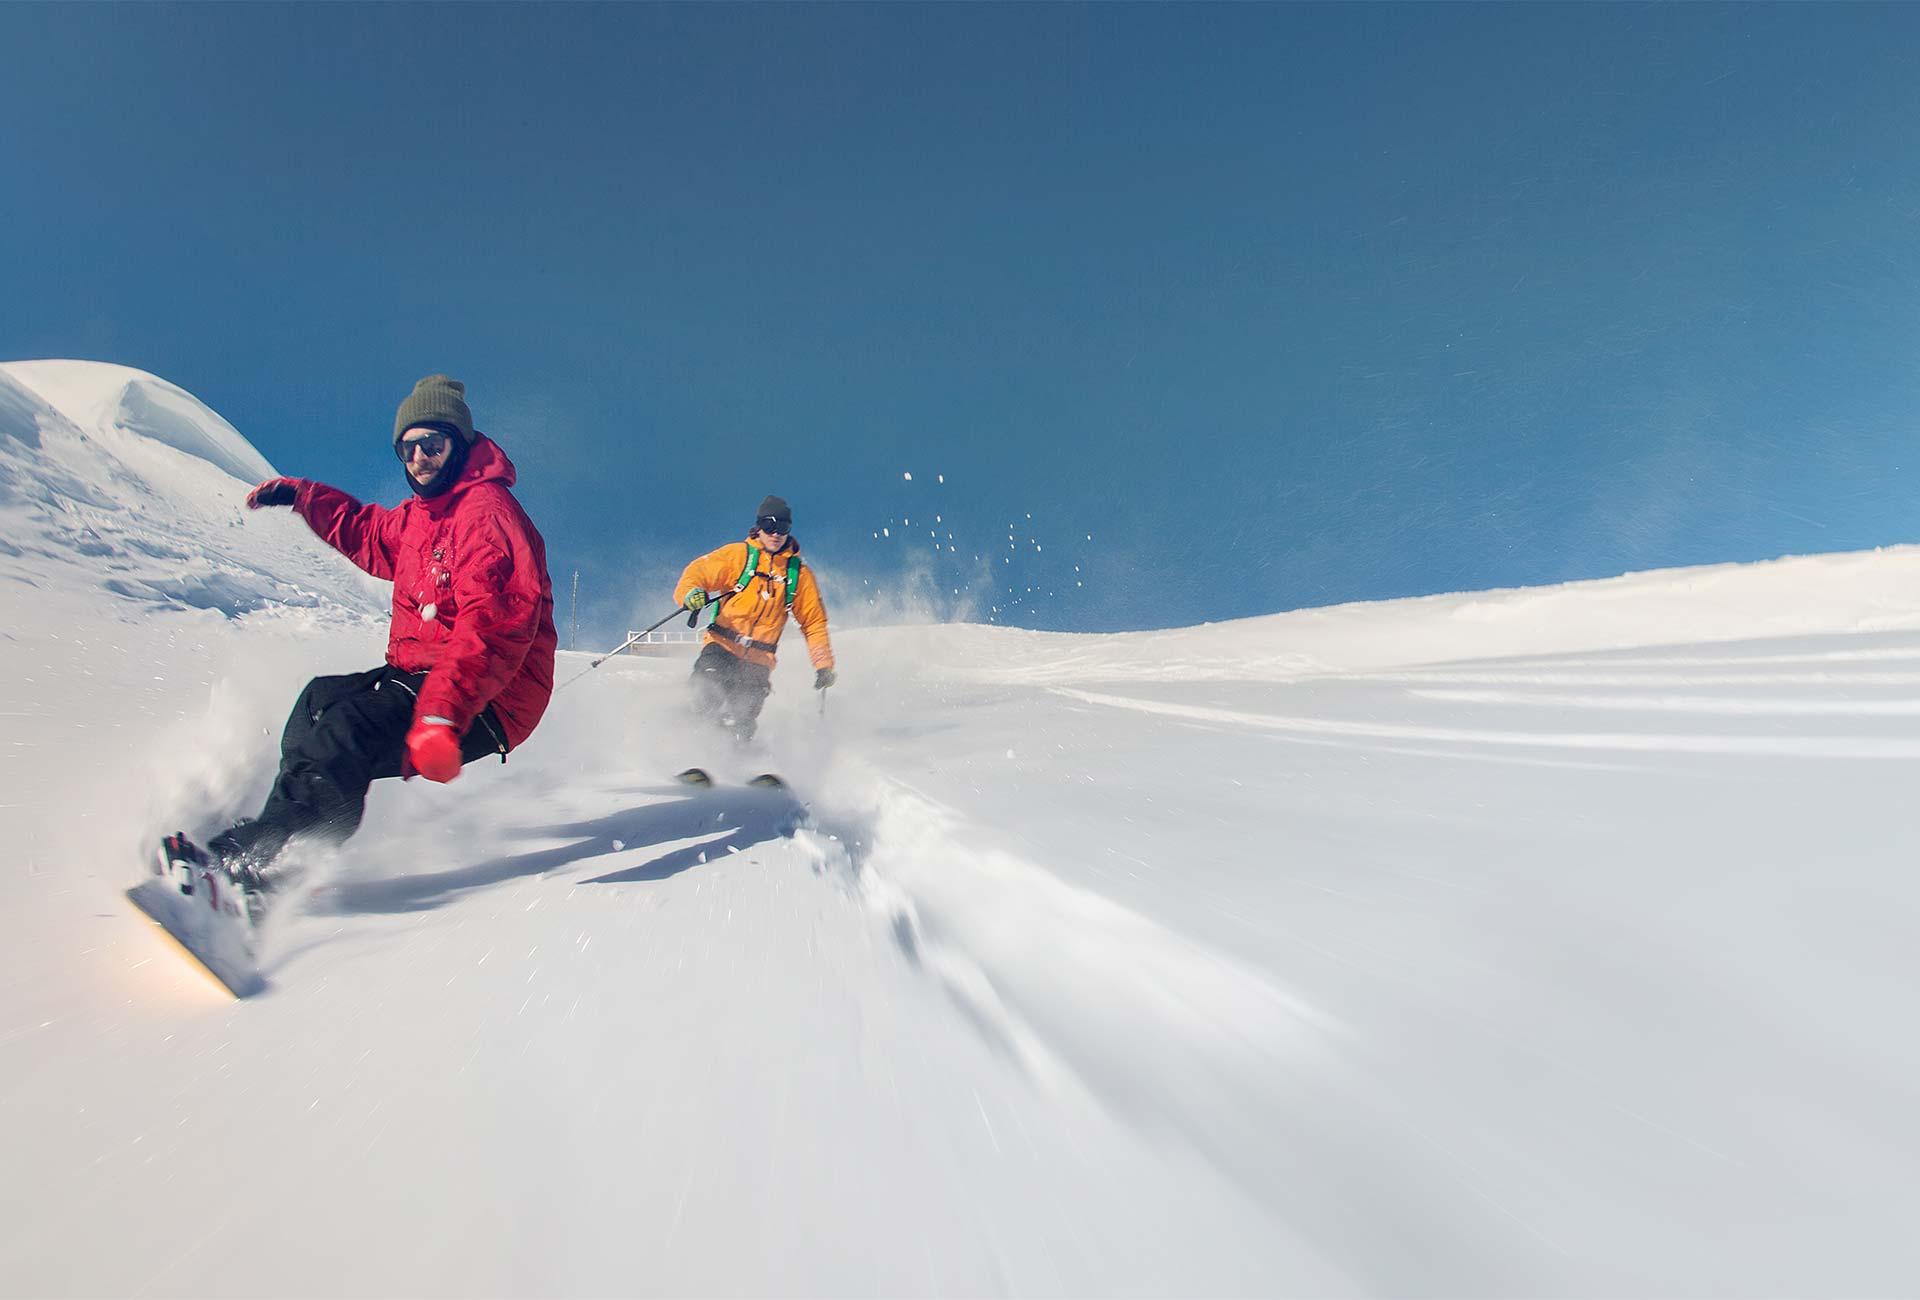 ski_snowboard_slider_11